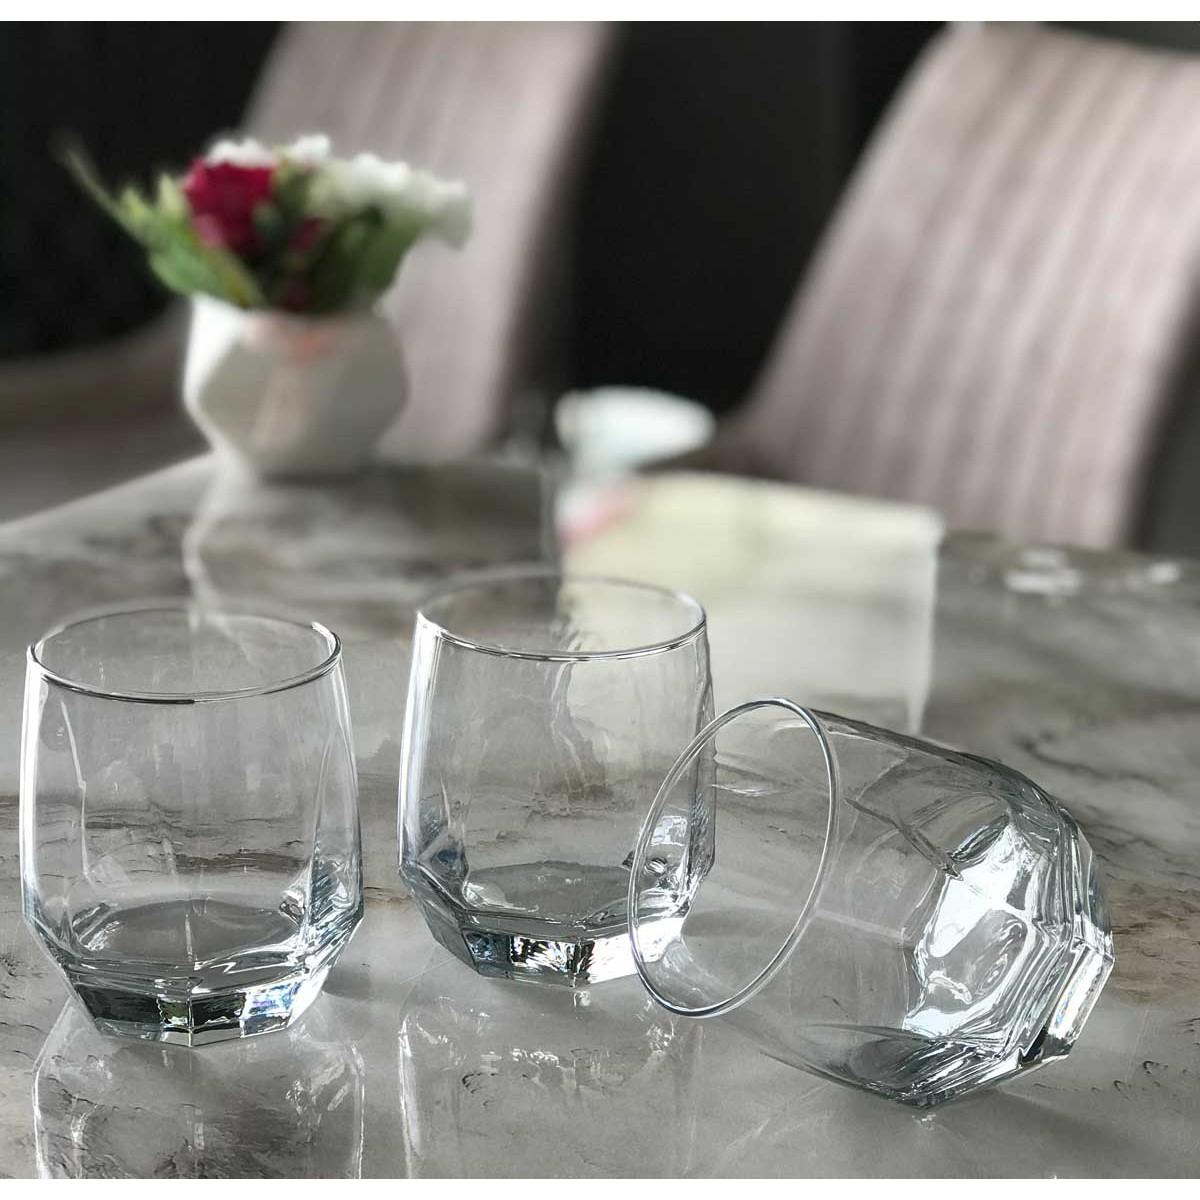 طقم كاسات زجاج تركي 3 قطع